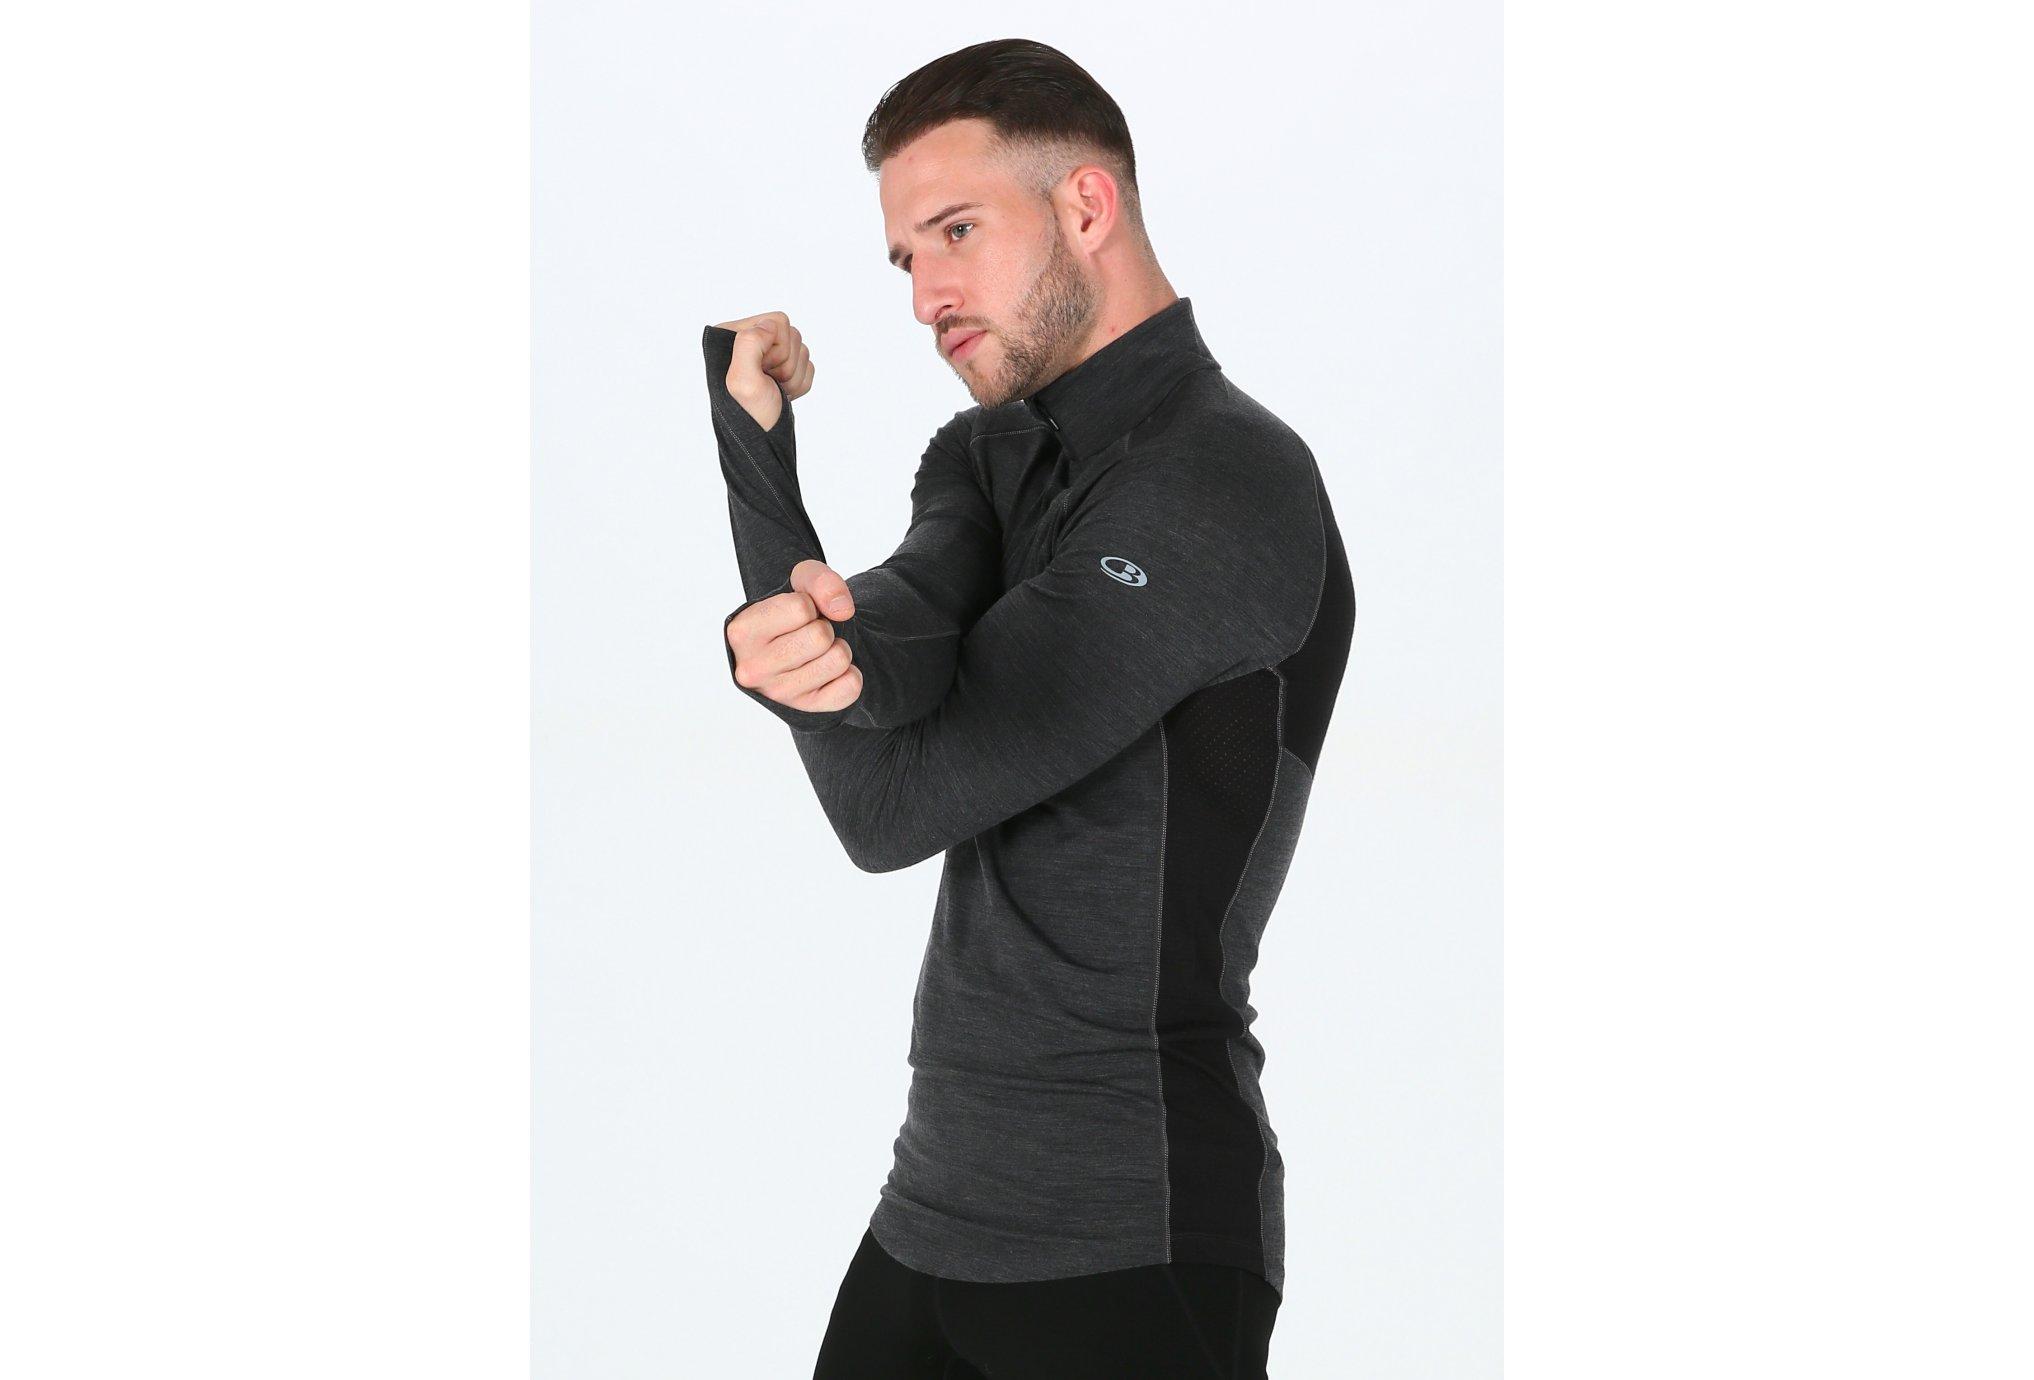 Icebreaker BodyfitZONE 200 M Diététique Vêtements homme